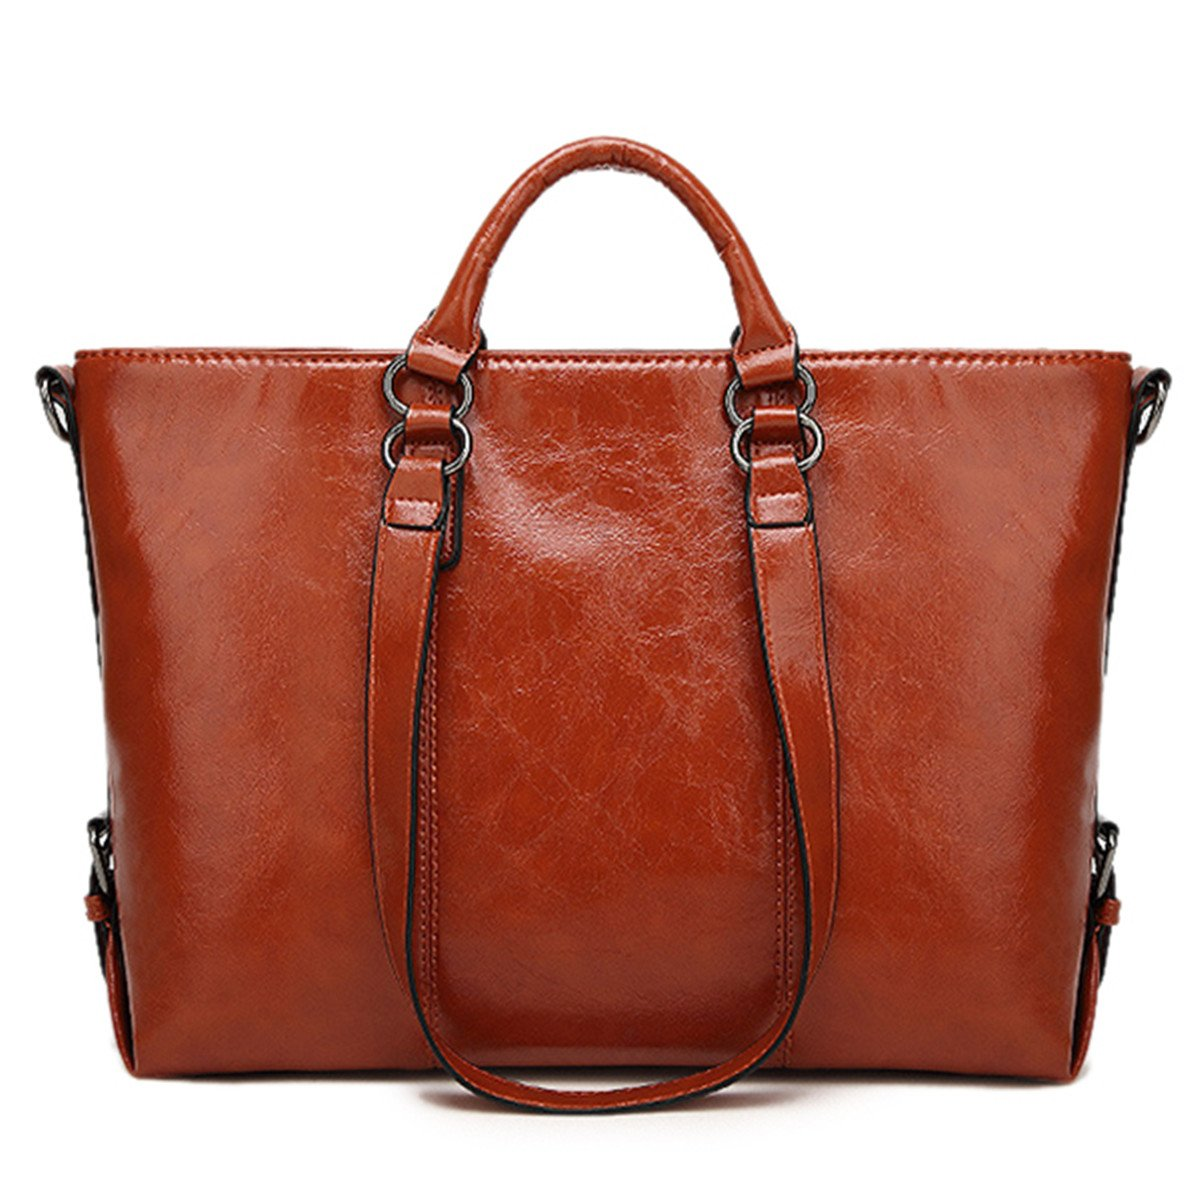 Women Fashion Minimalist Handbag Leisure Business Shoulder Bag Tote Bag Brown 13.78''(L) x 4.72''(W) x 10.63''(H)